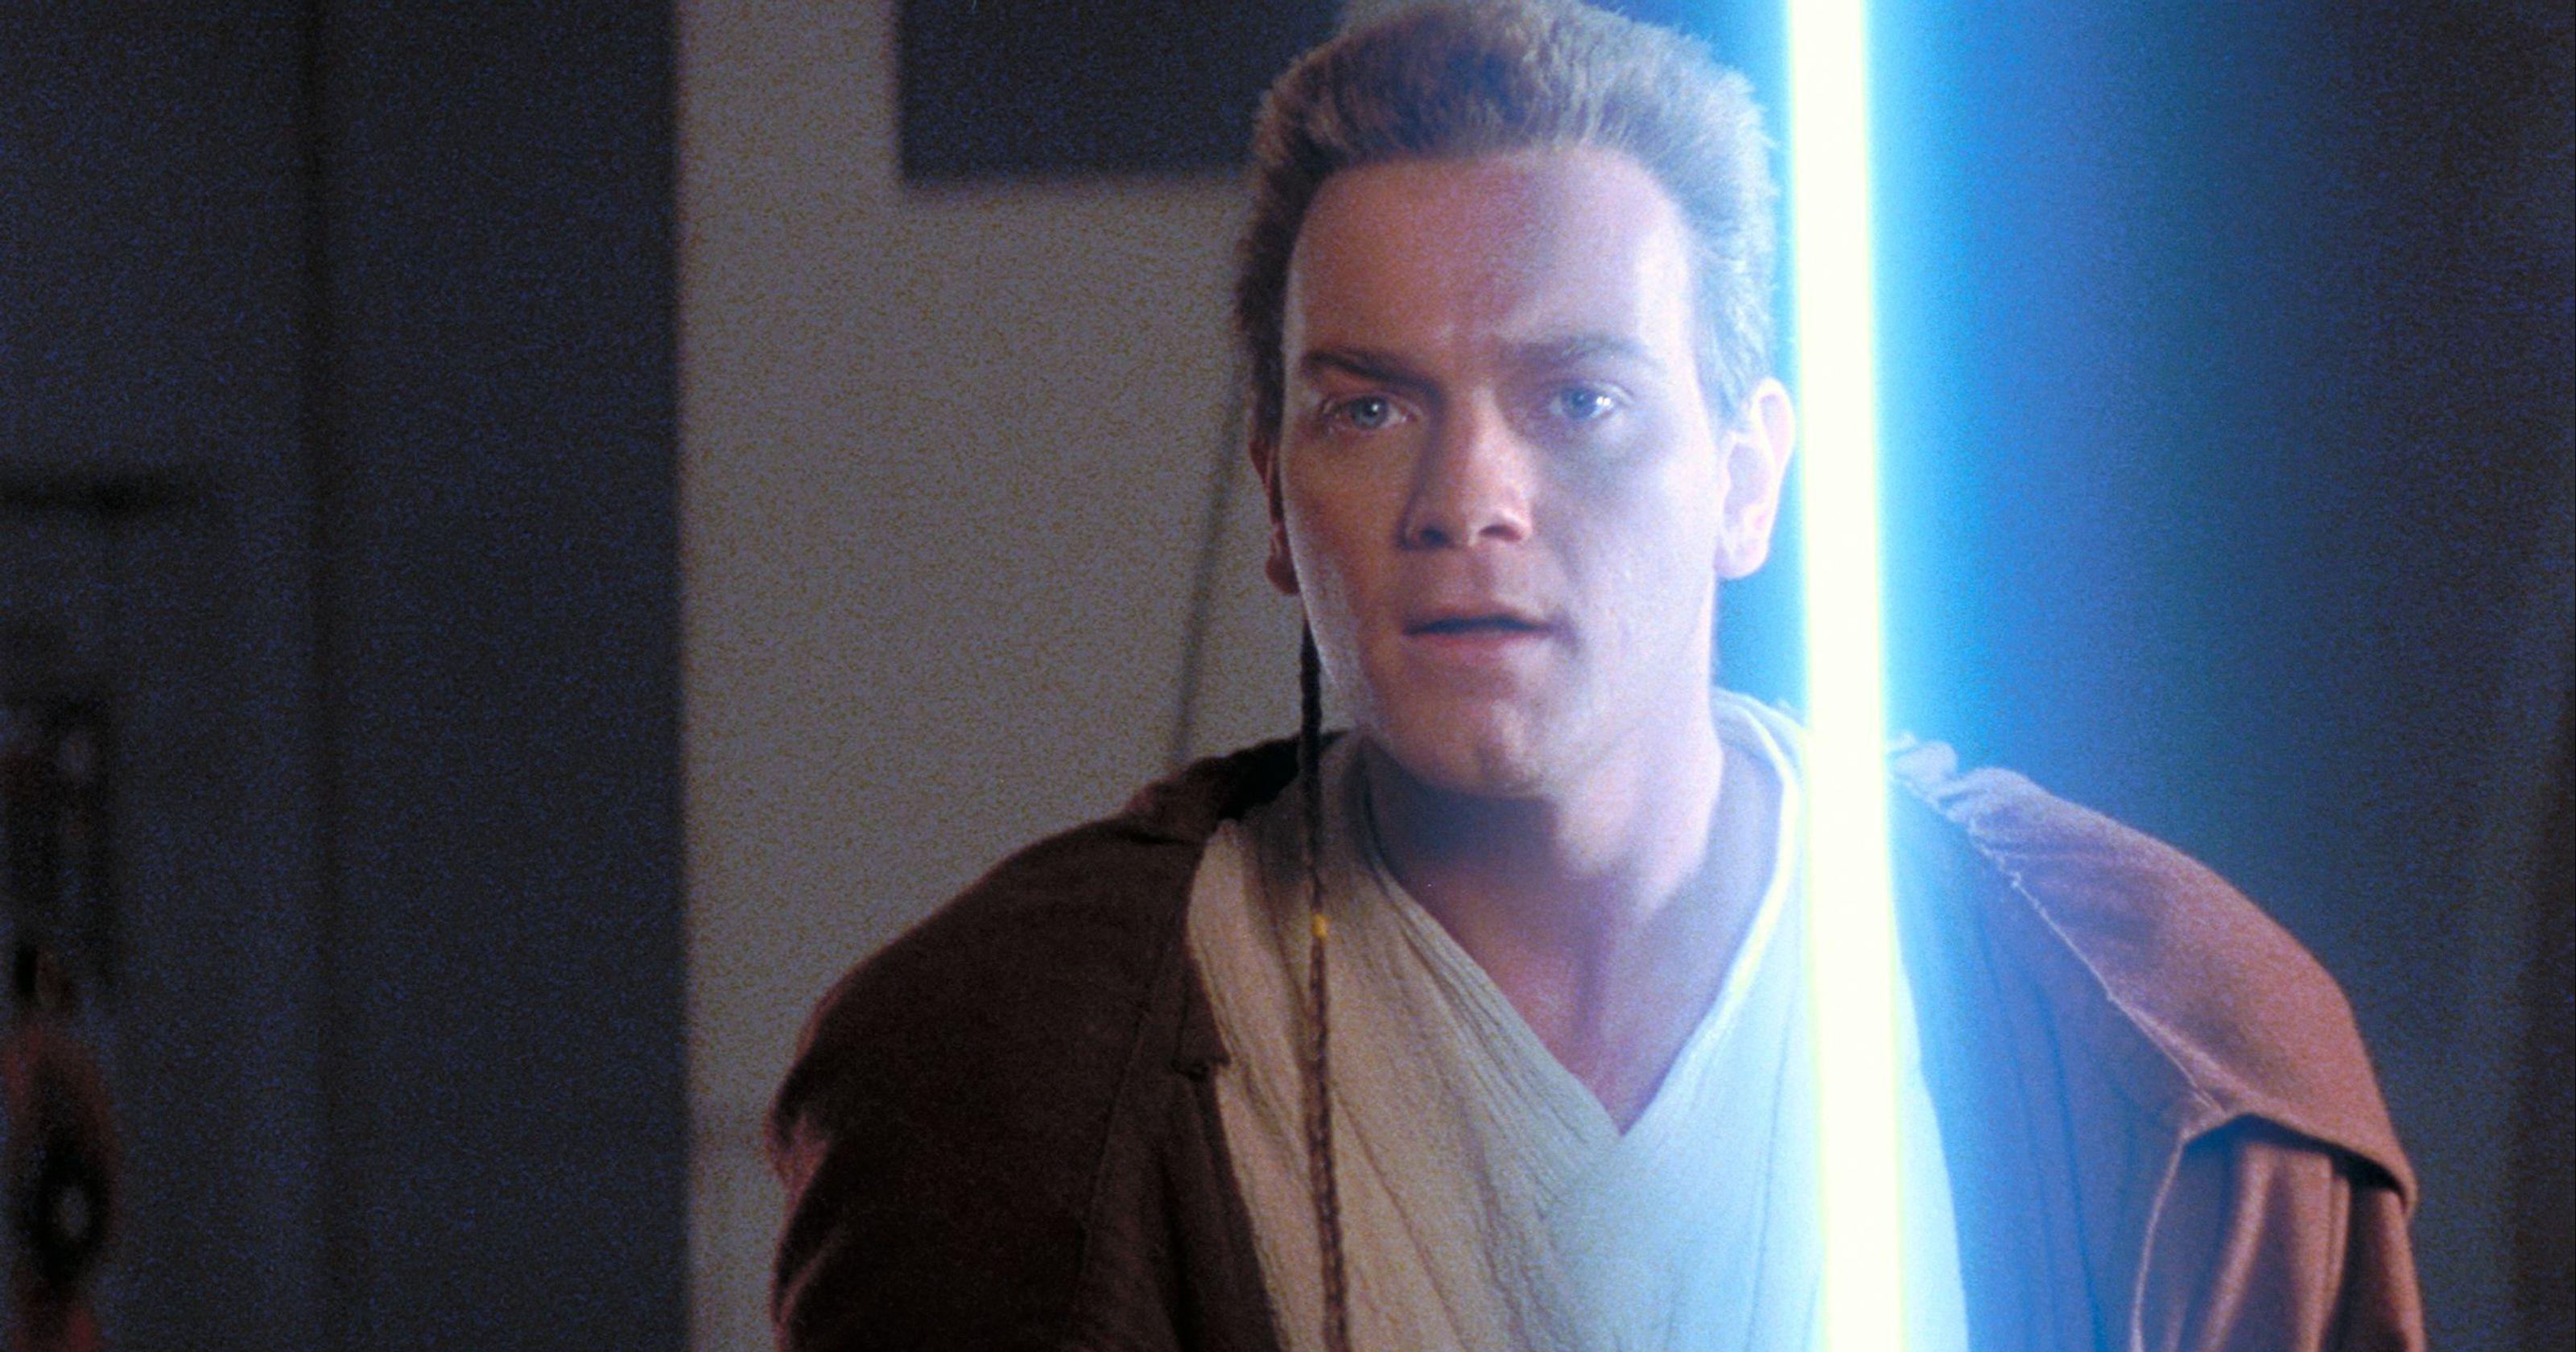 Star Wars Episode I The Phantom Menace Obi Wan Kenobi Hd